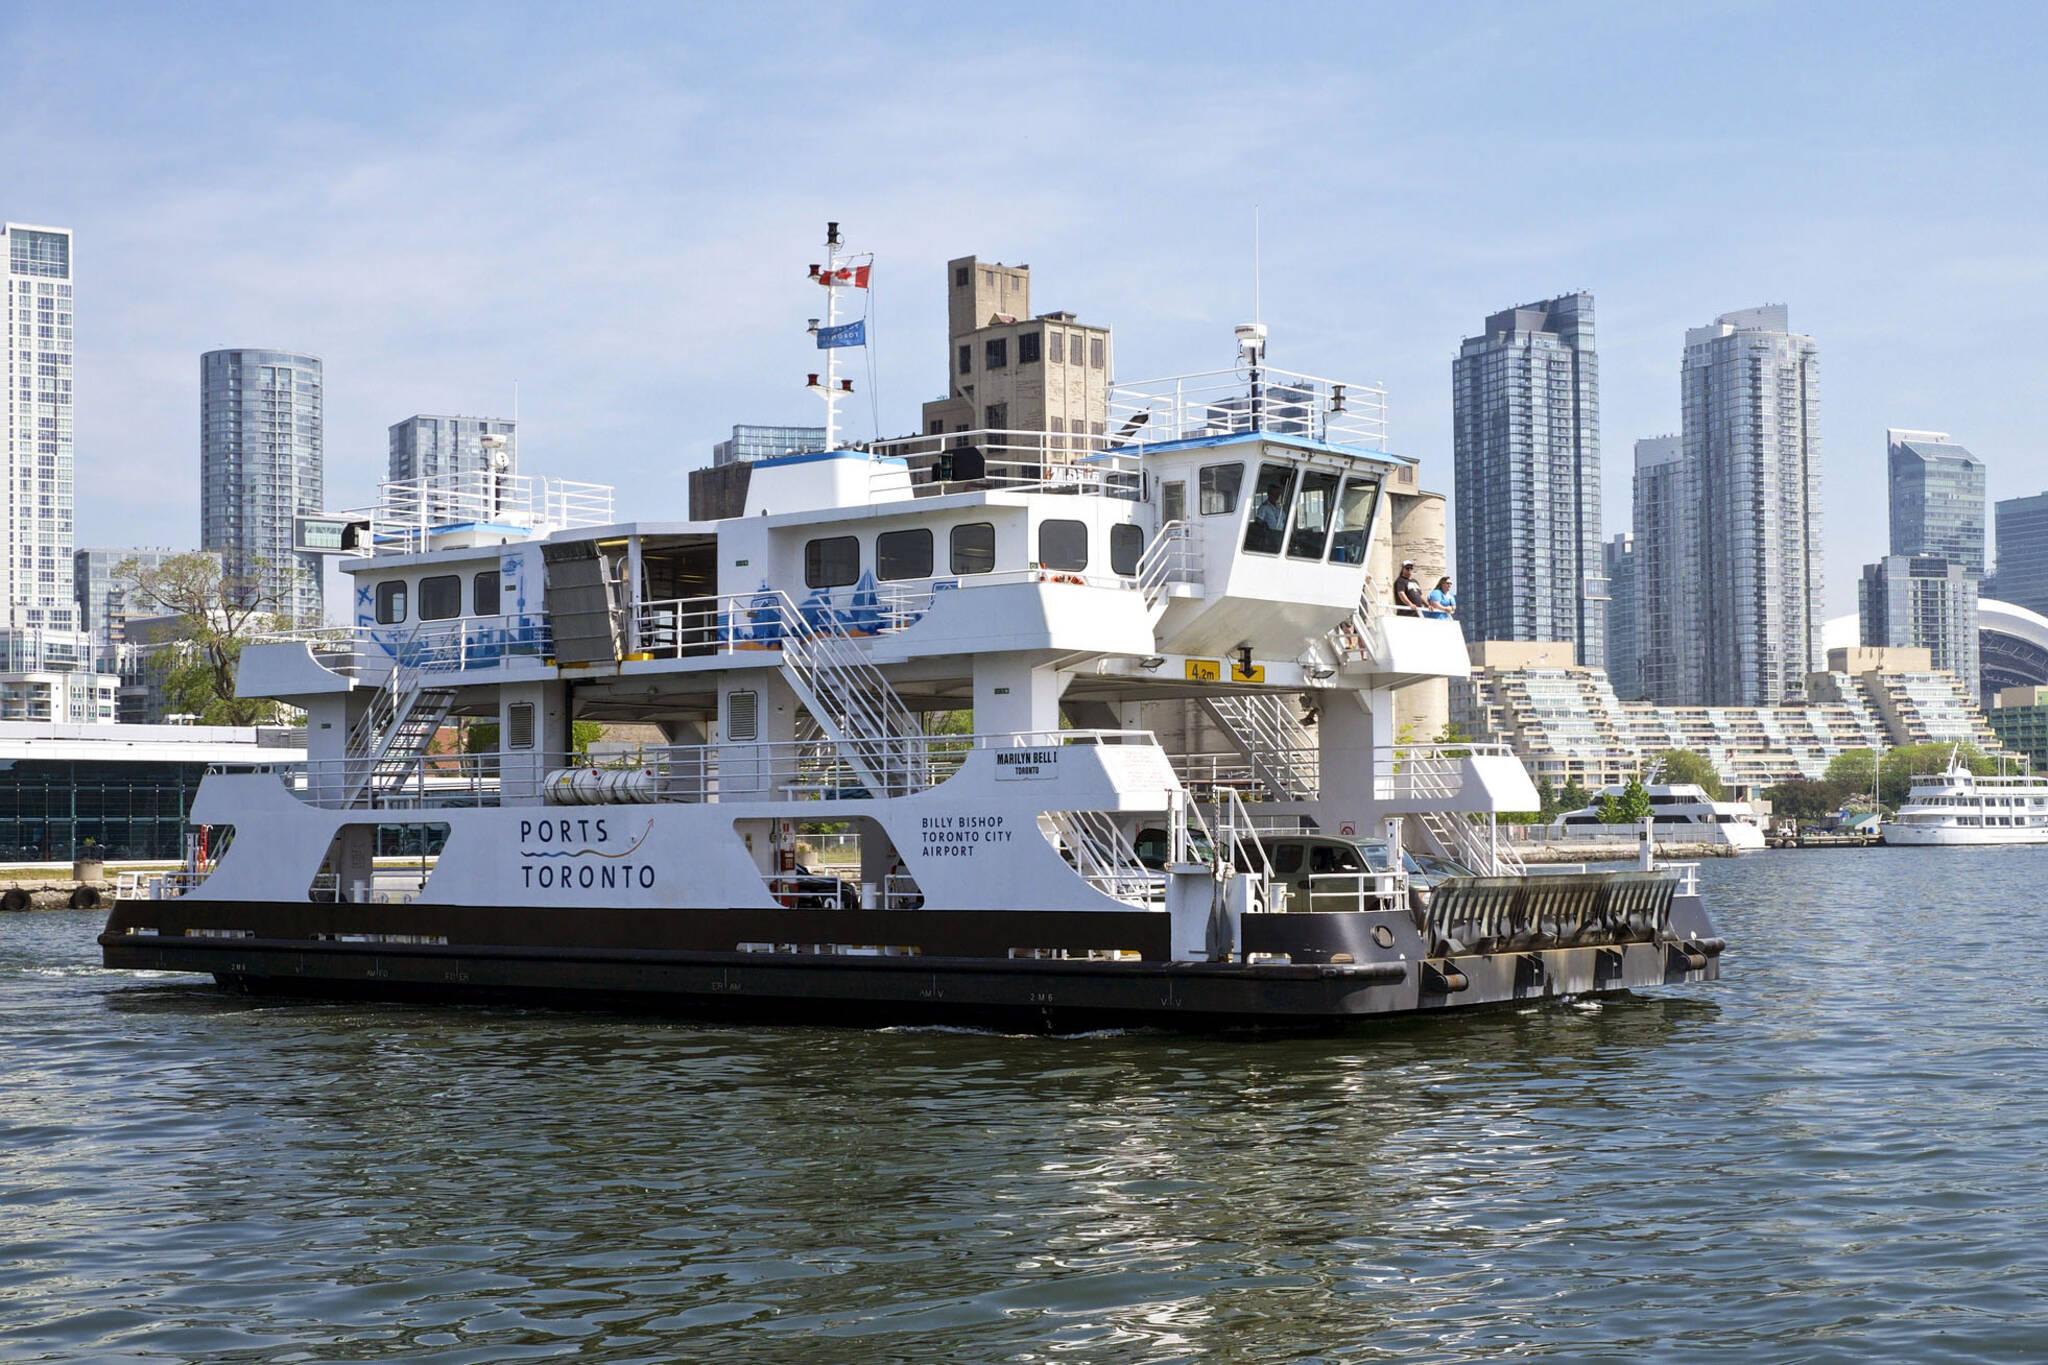 Island Airport ferry